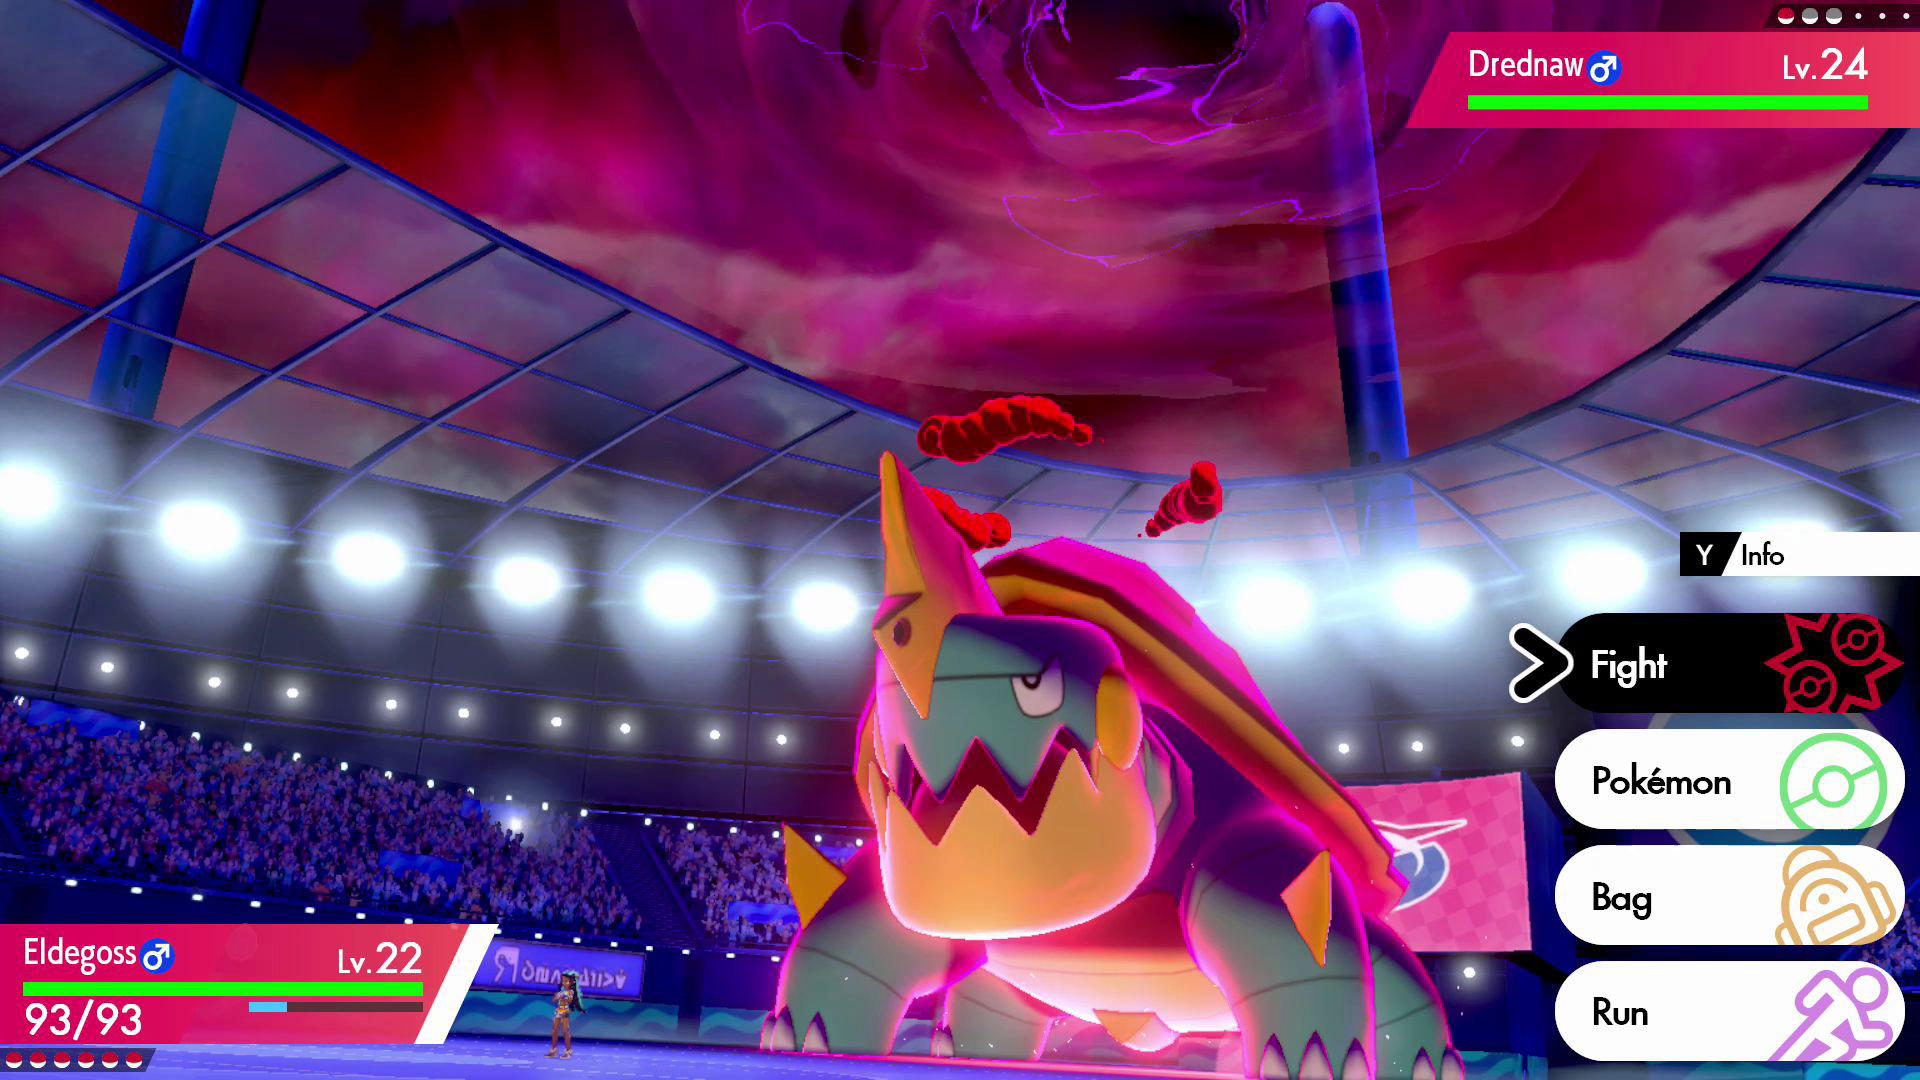 Drednaw using Dynamax in a Pokémon Gym battle